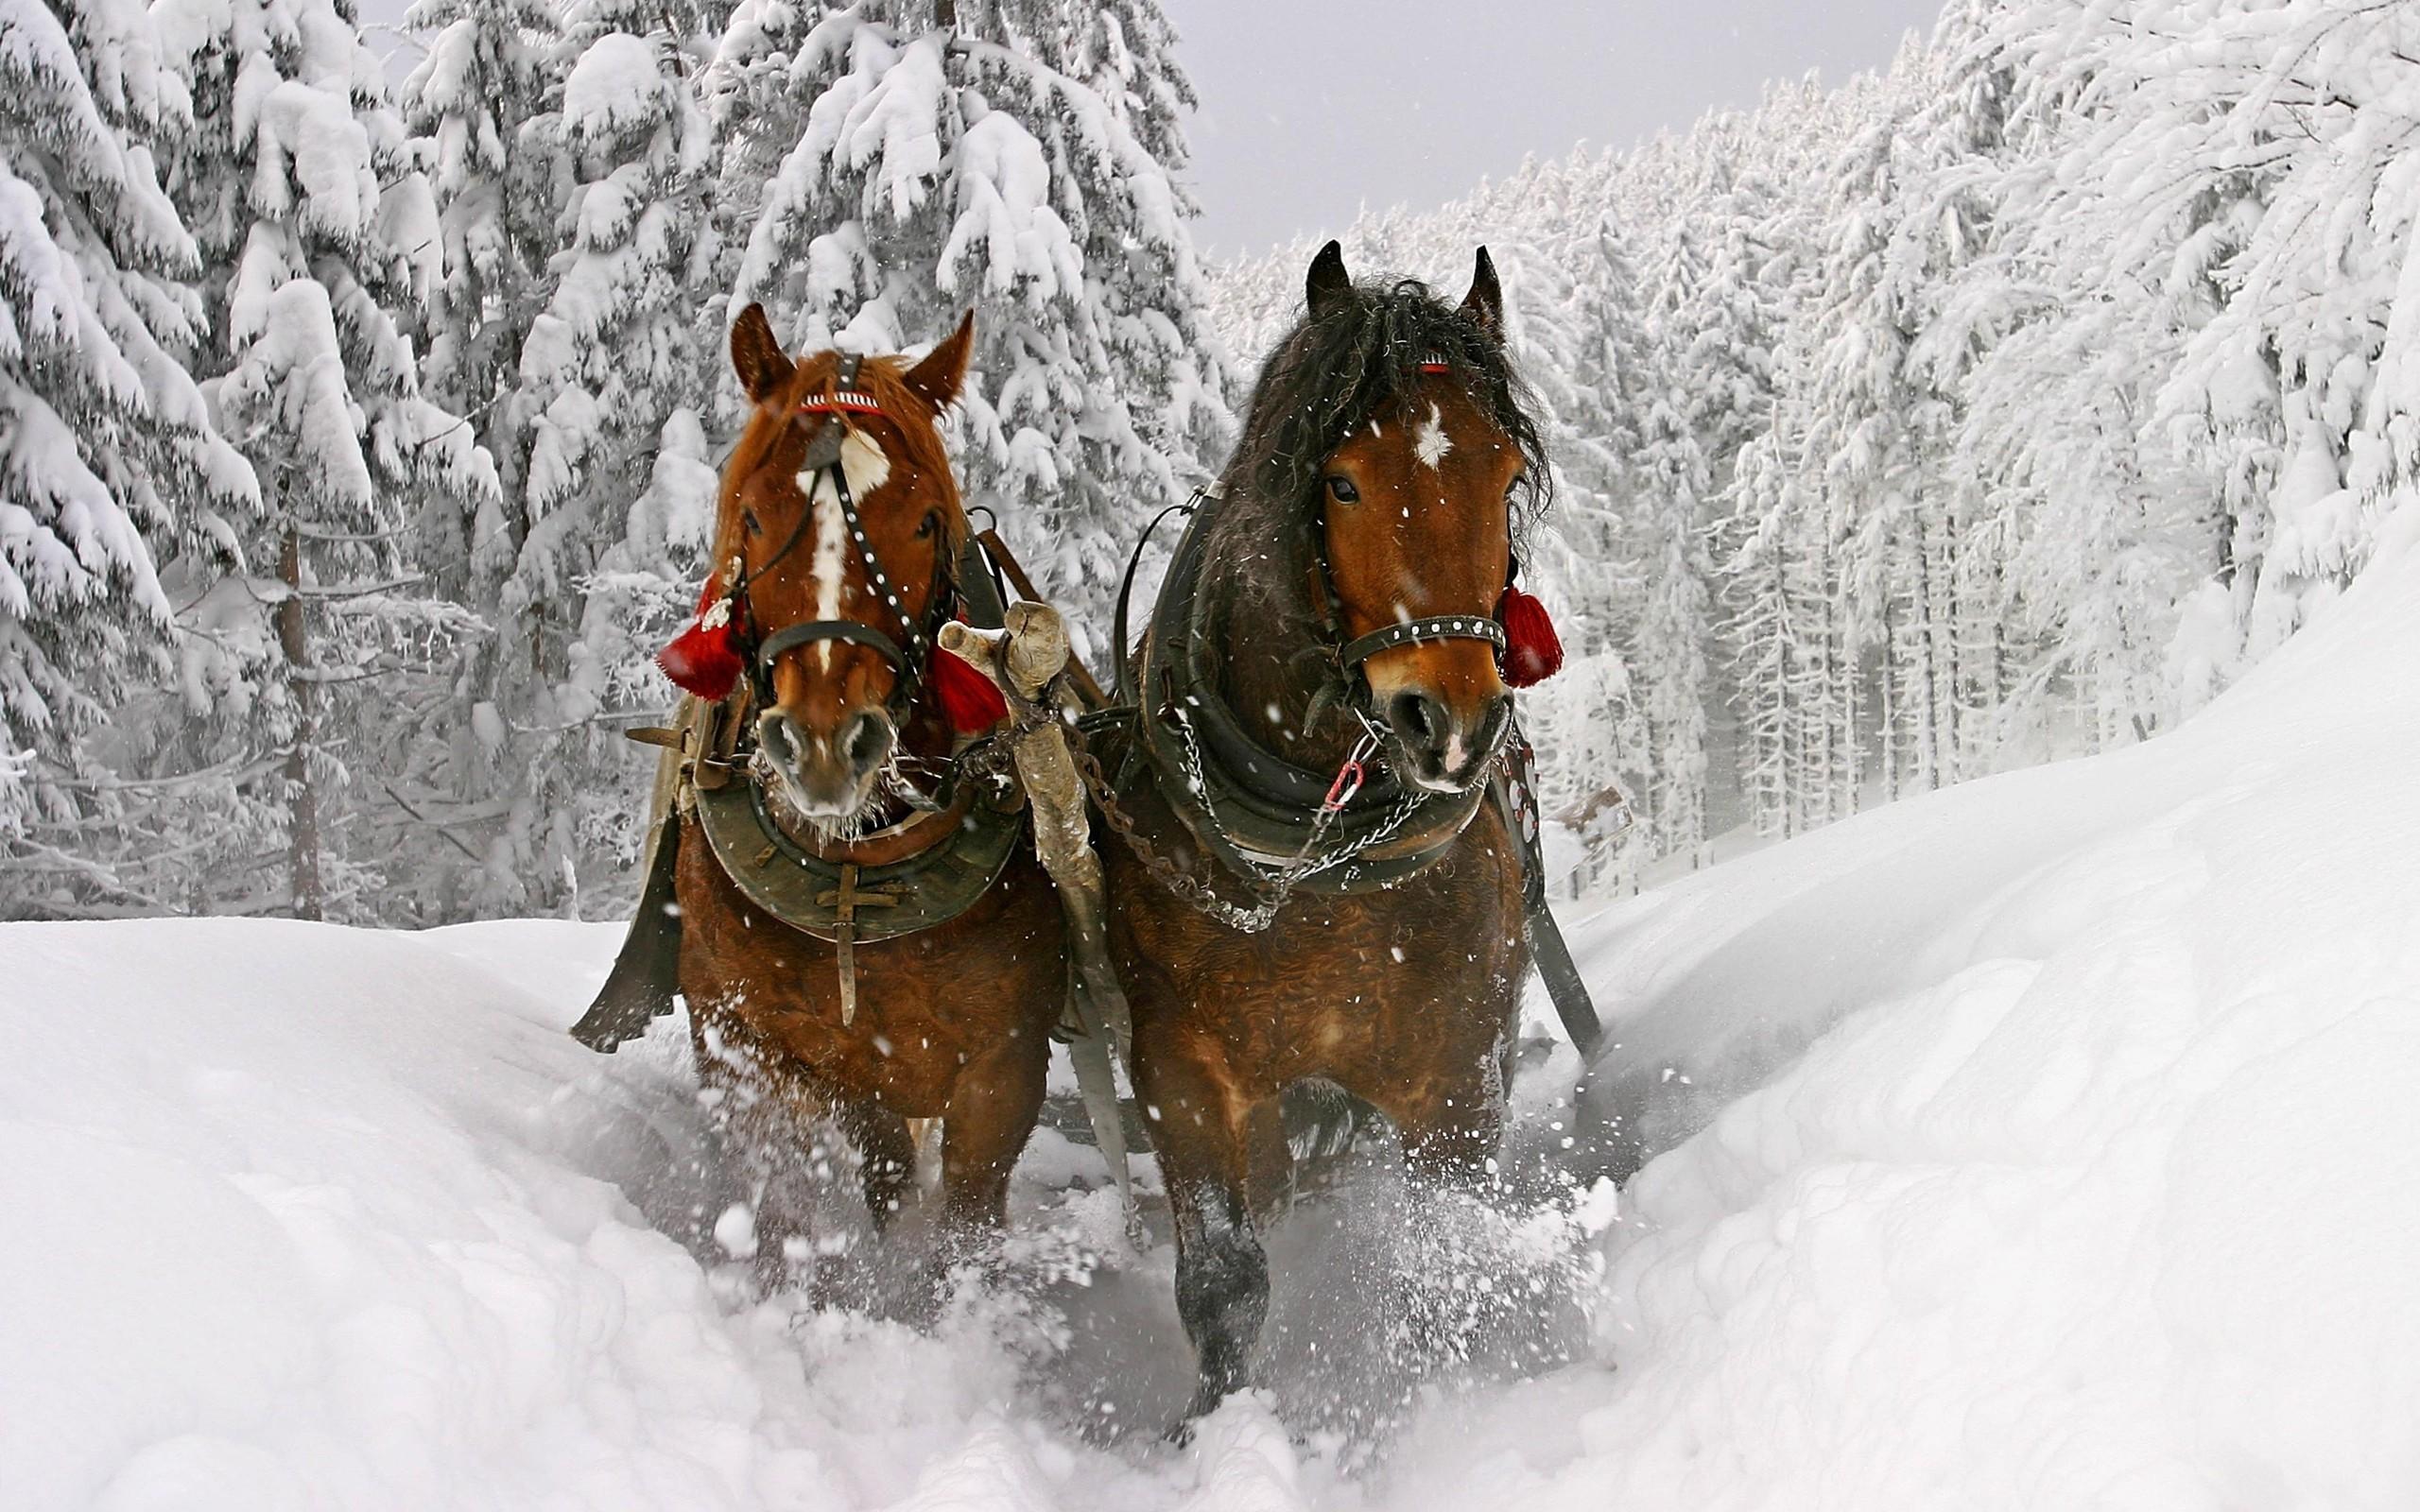 Res: 2560x1600, Snow Dashing Horses Wallpaper